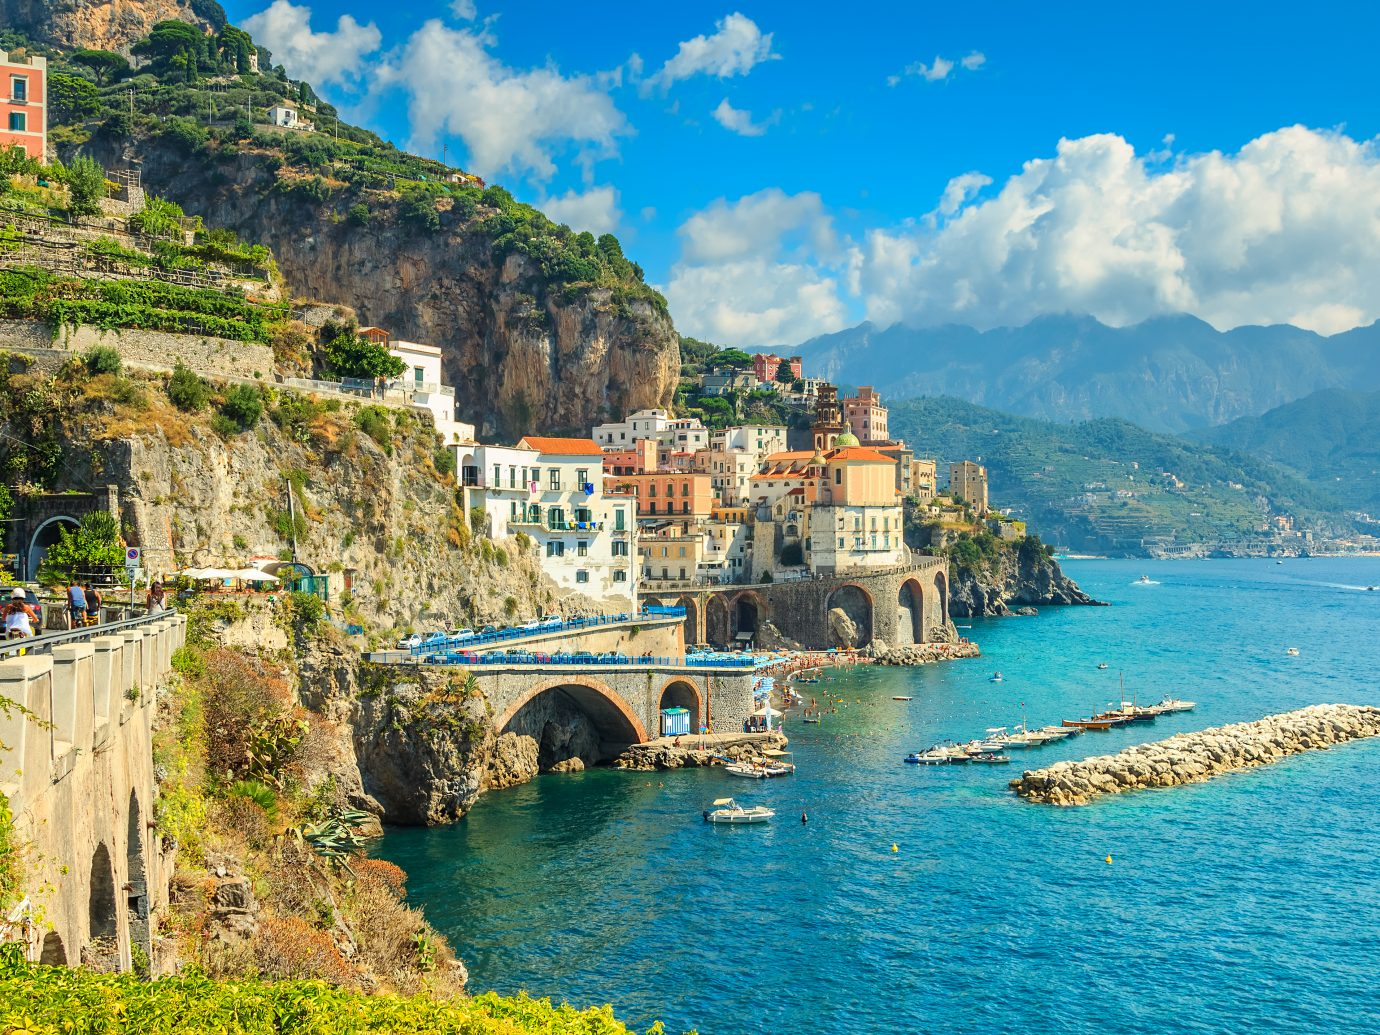 Panoramic view of Amalfi and harbor,Italy,Europe